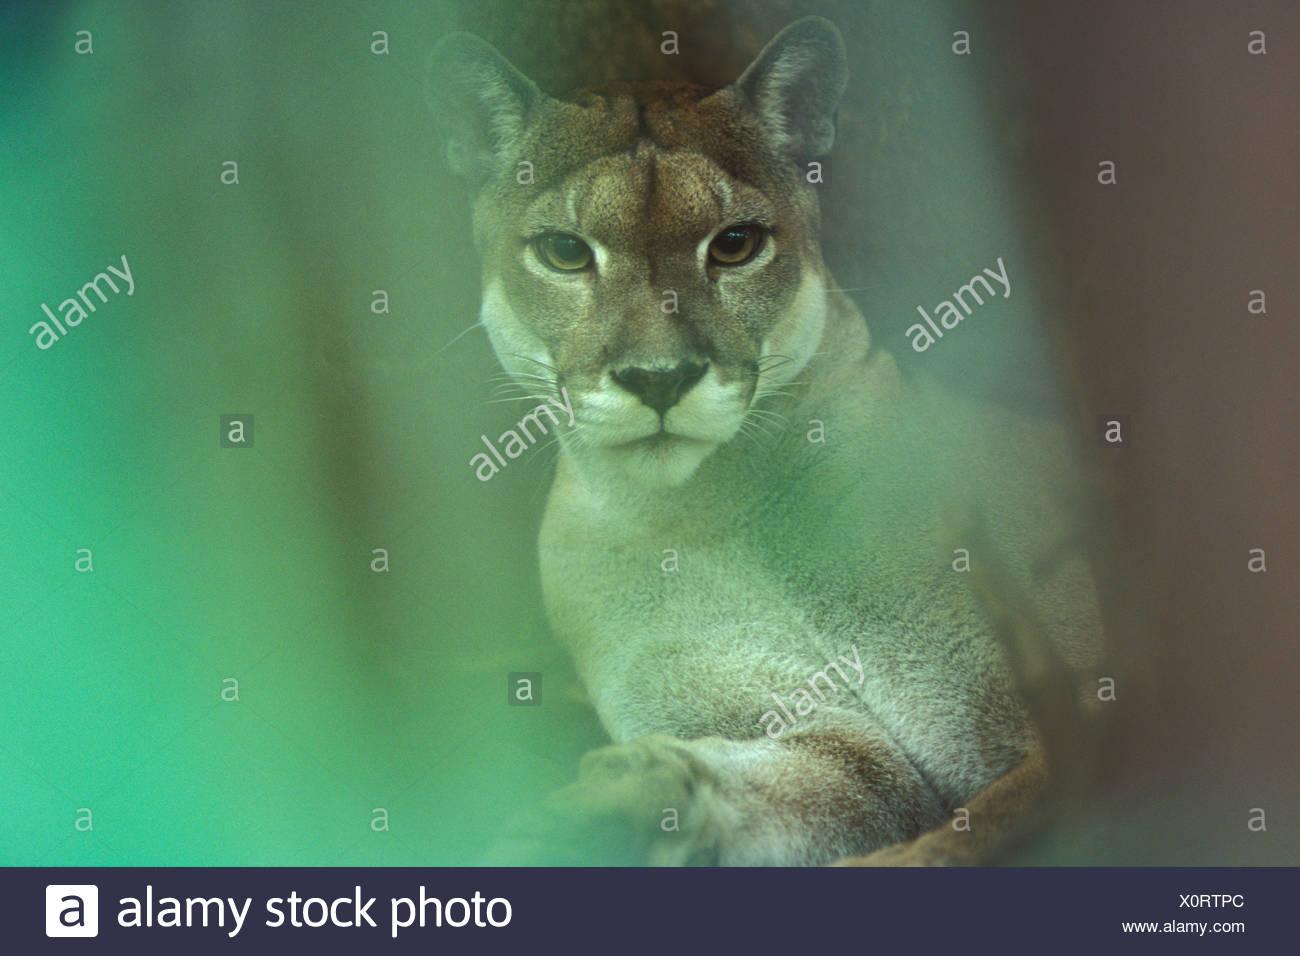 Wild Puma (Felis concolor), Braulio Carrillo NP, Costa Rica - Stock Image